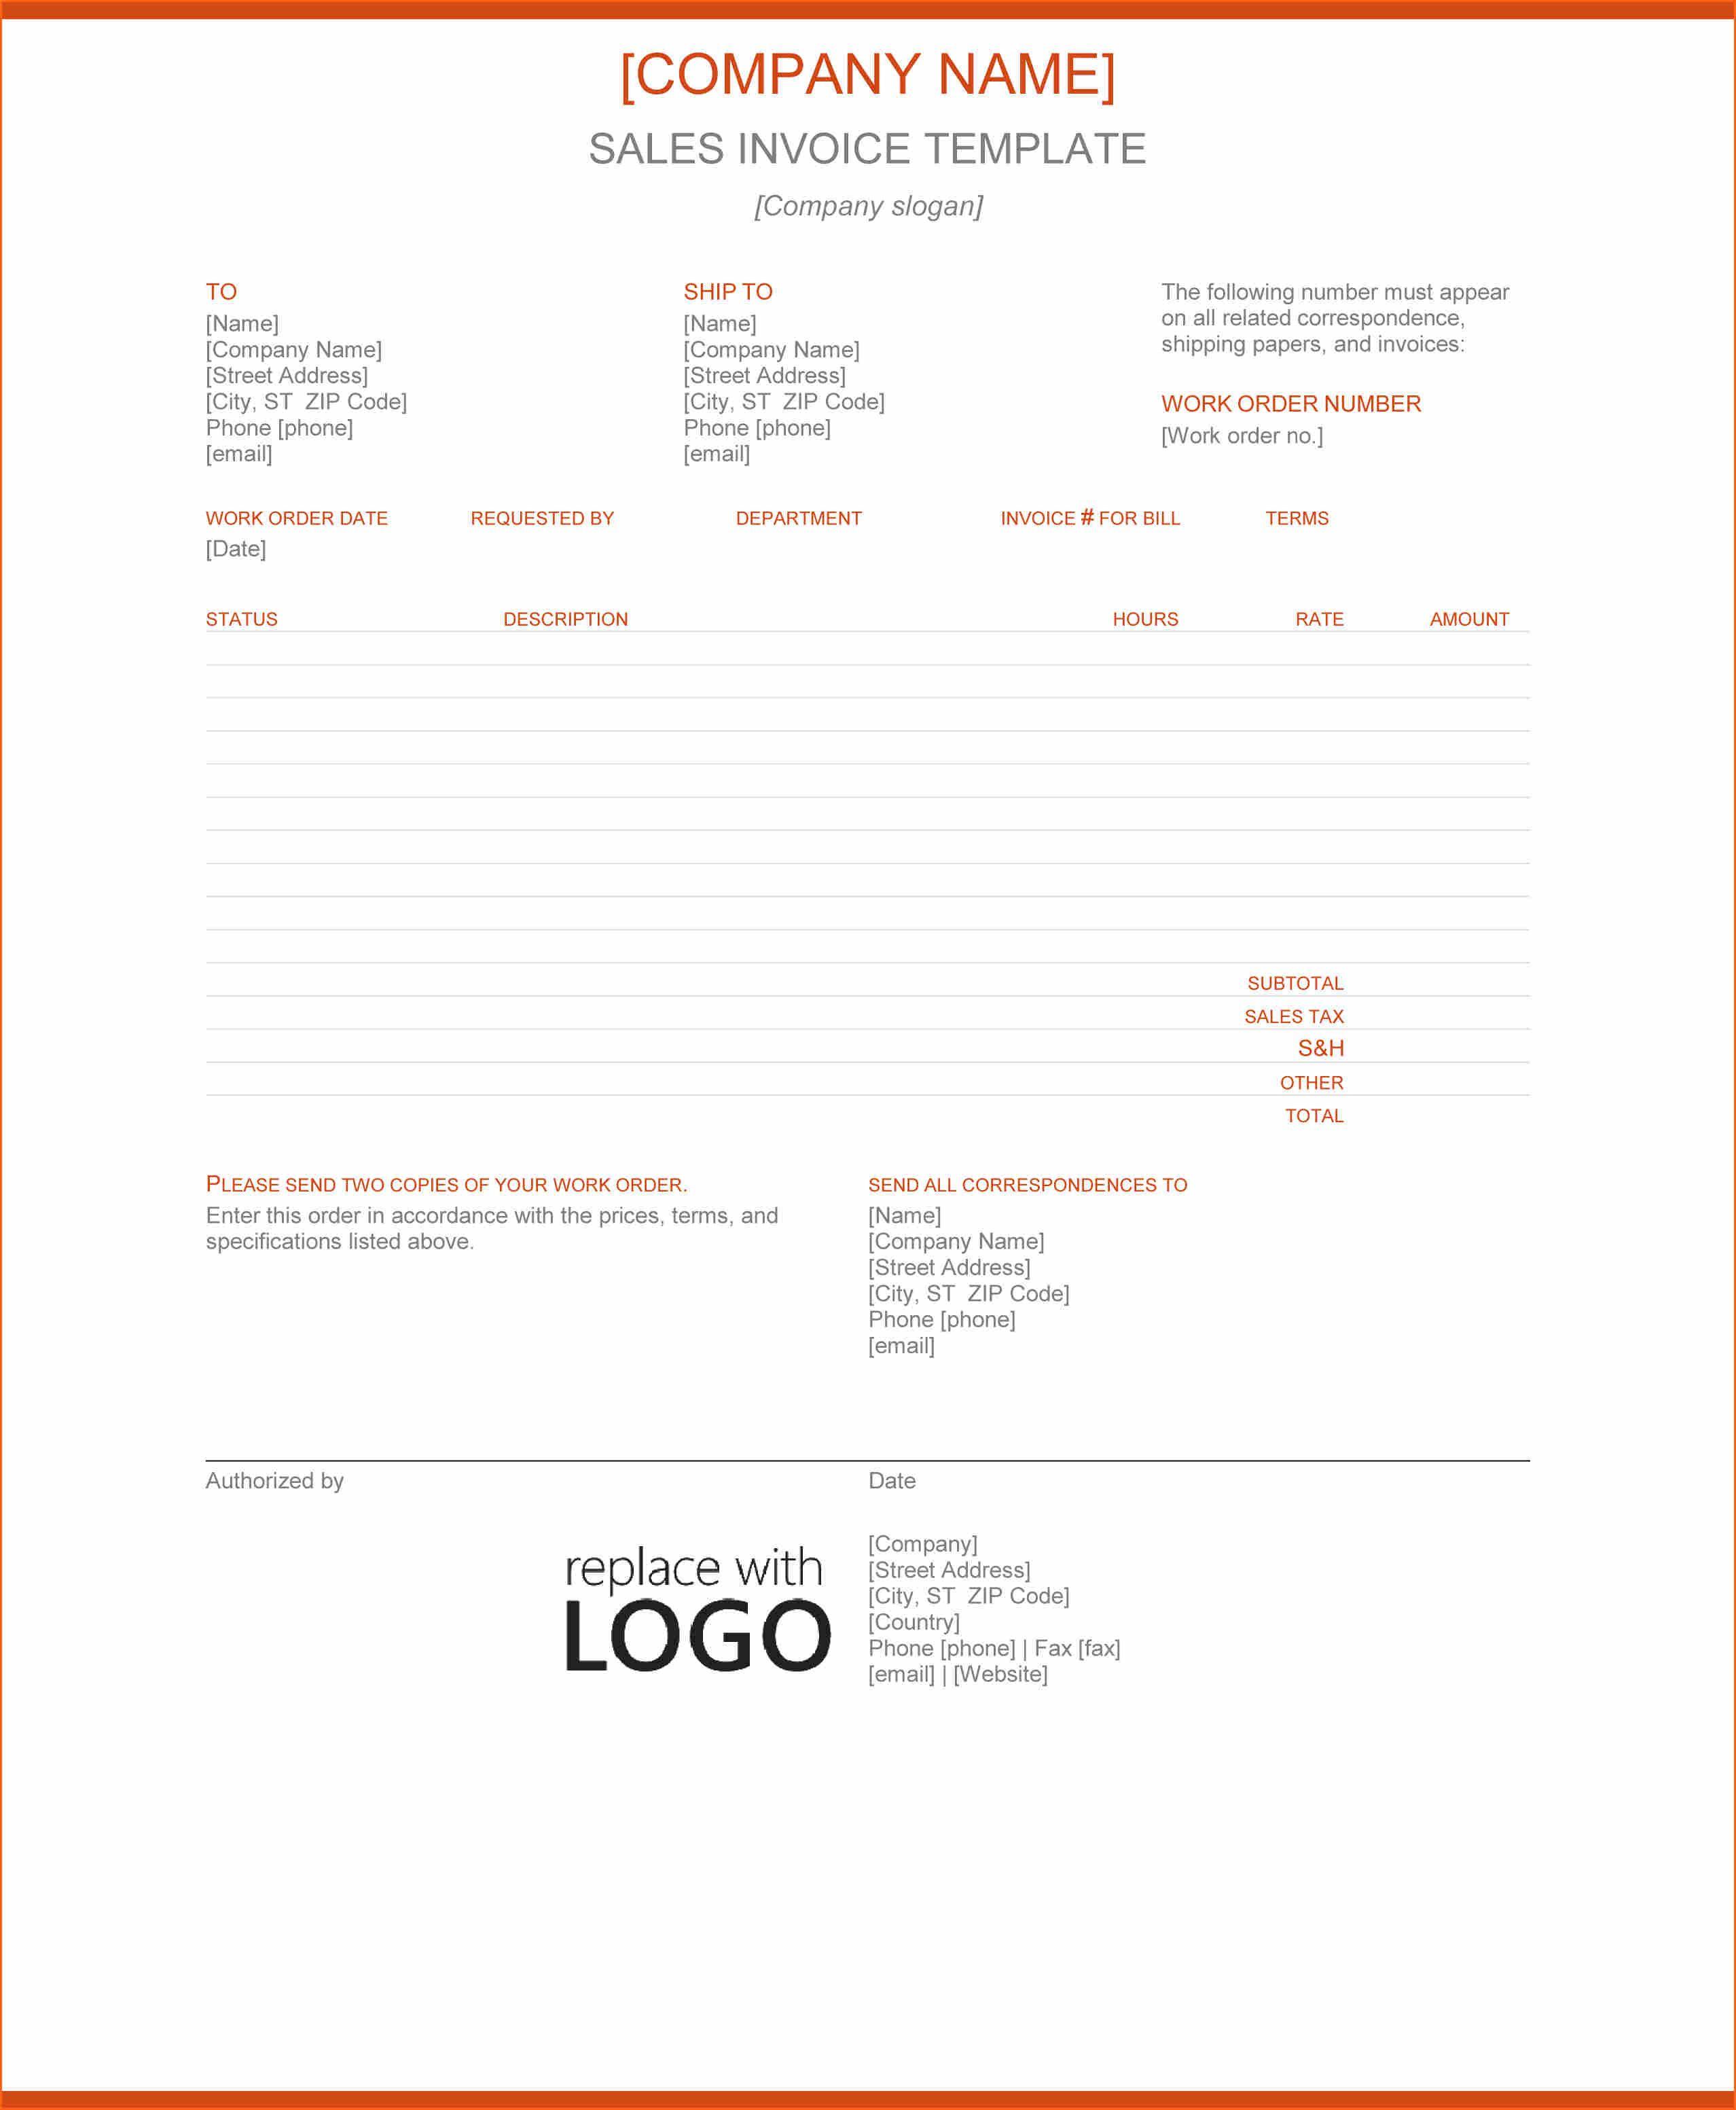 Google Docs Templates Resume Sales Invoice Template With Discount Percentage Column Google Docs